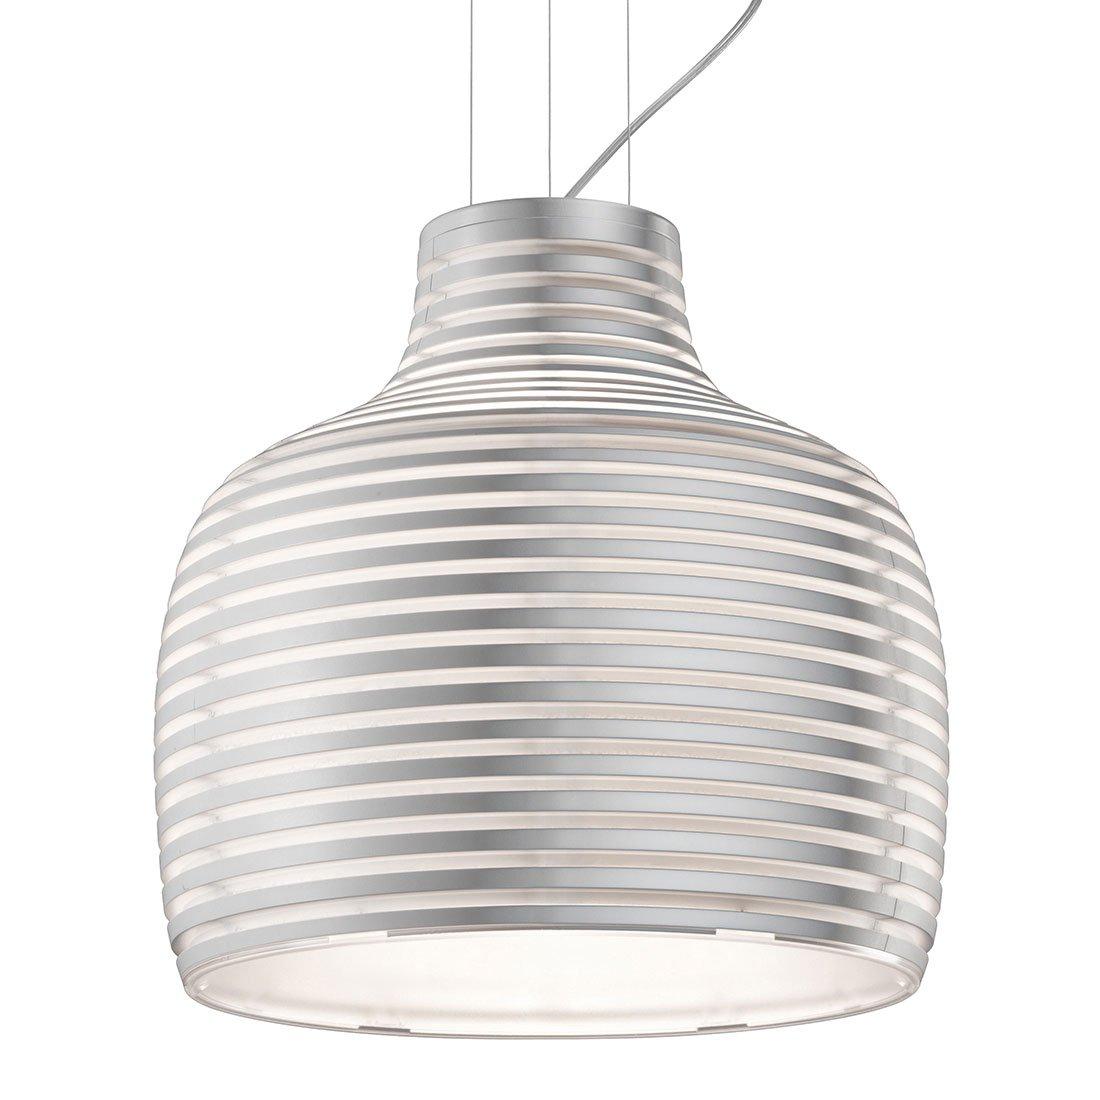 Foscarini Behive Hanglamp Wit